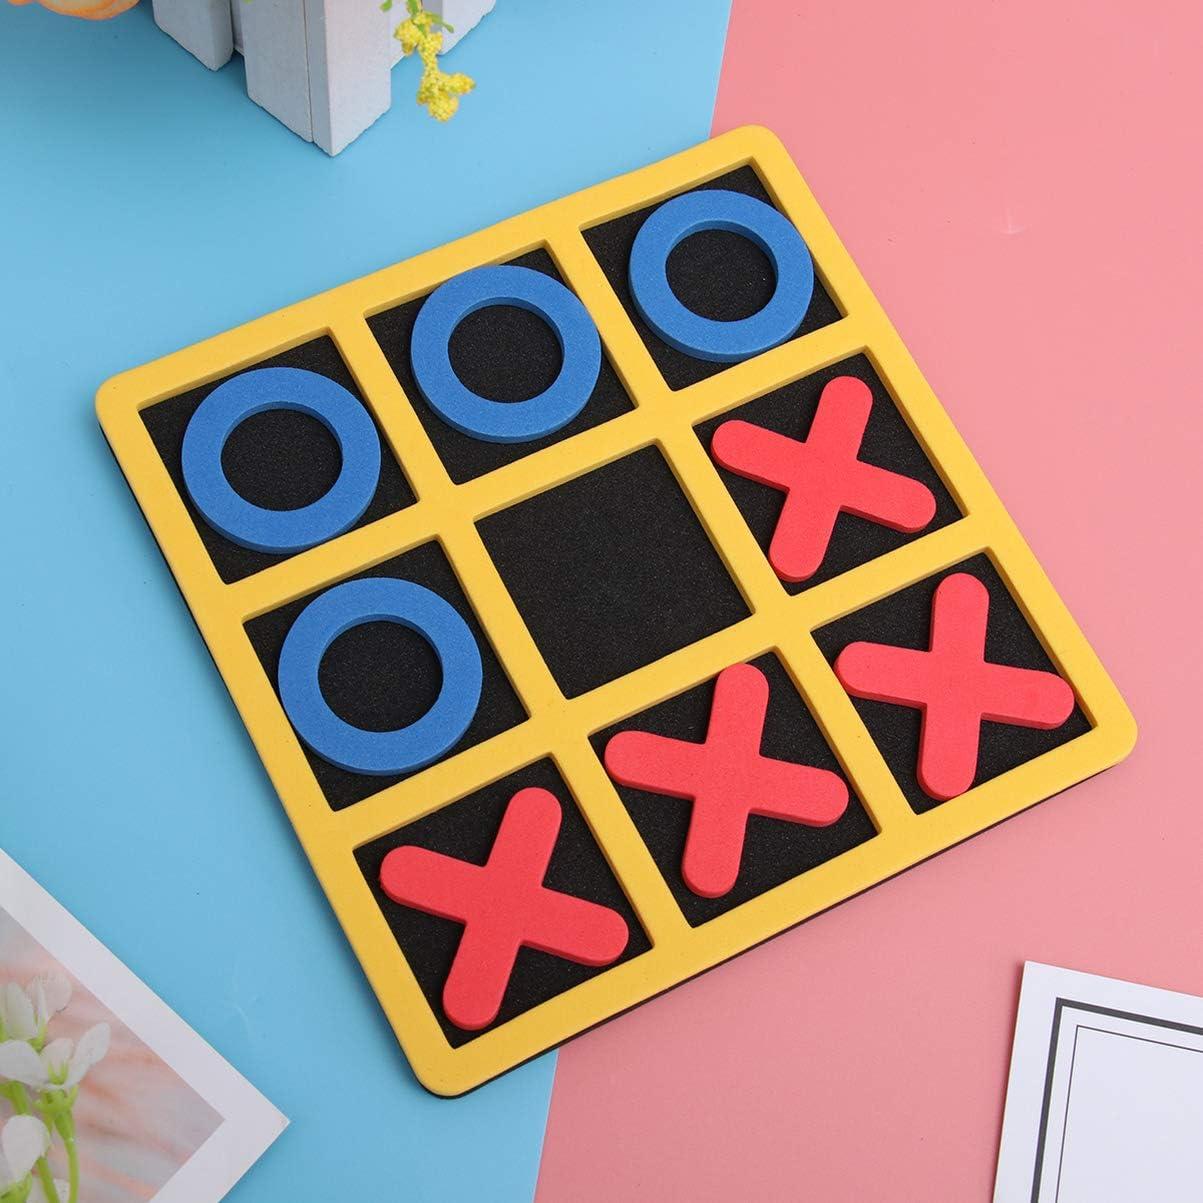 TOYANDONA 3 St/ück Tic Tac Toe Brettspiele tragbare Puzzle Board kognitive Lernspielzeug Schach Lernspielzeug f/ür Kinder